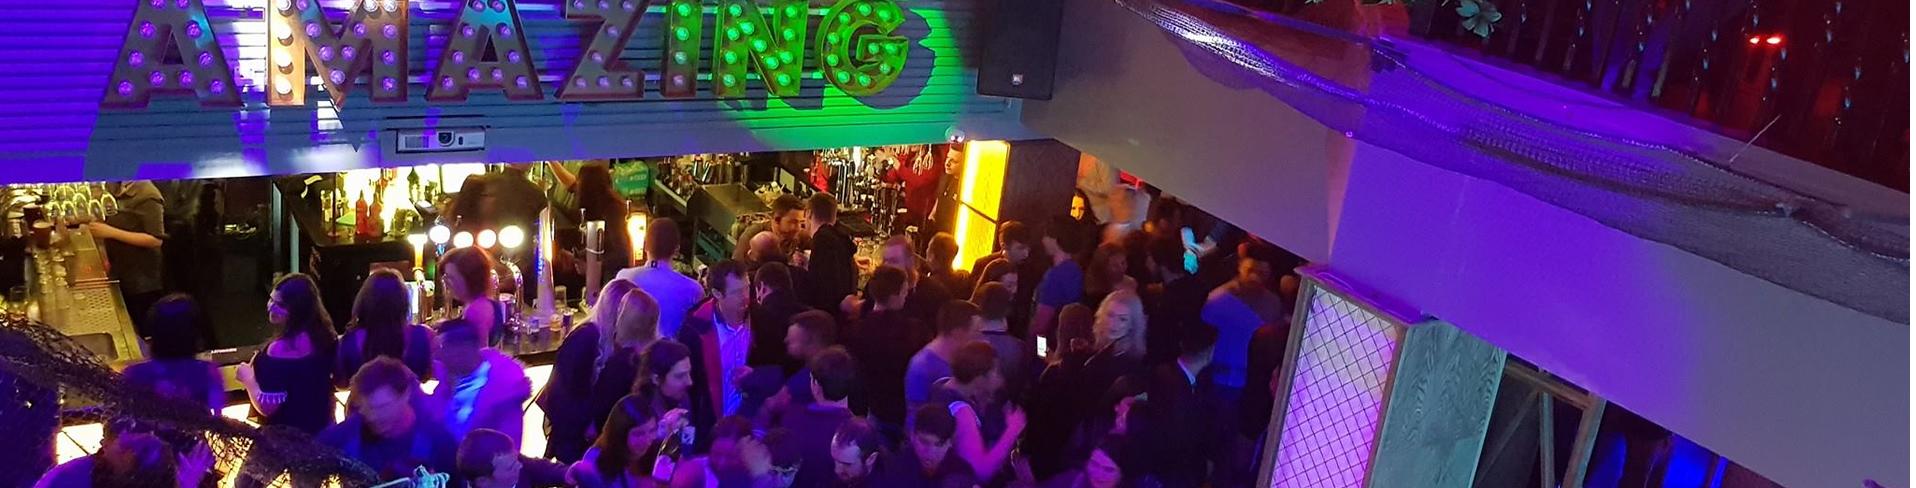 Dance floor at Garavogue Bar Sligo full of dancers